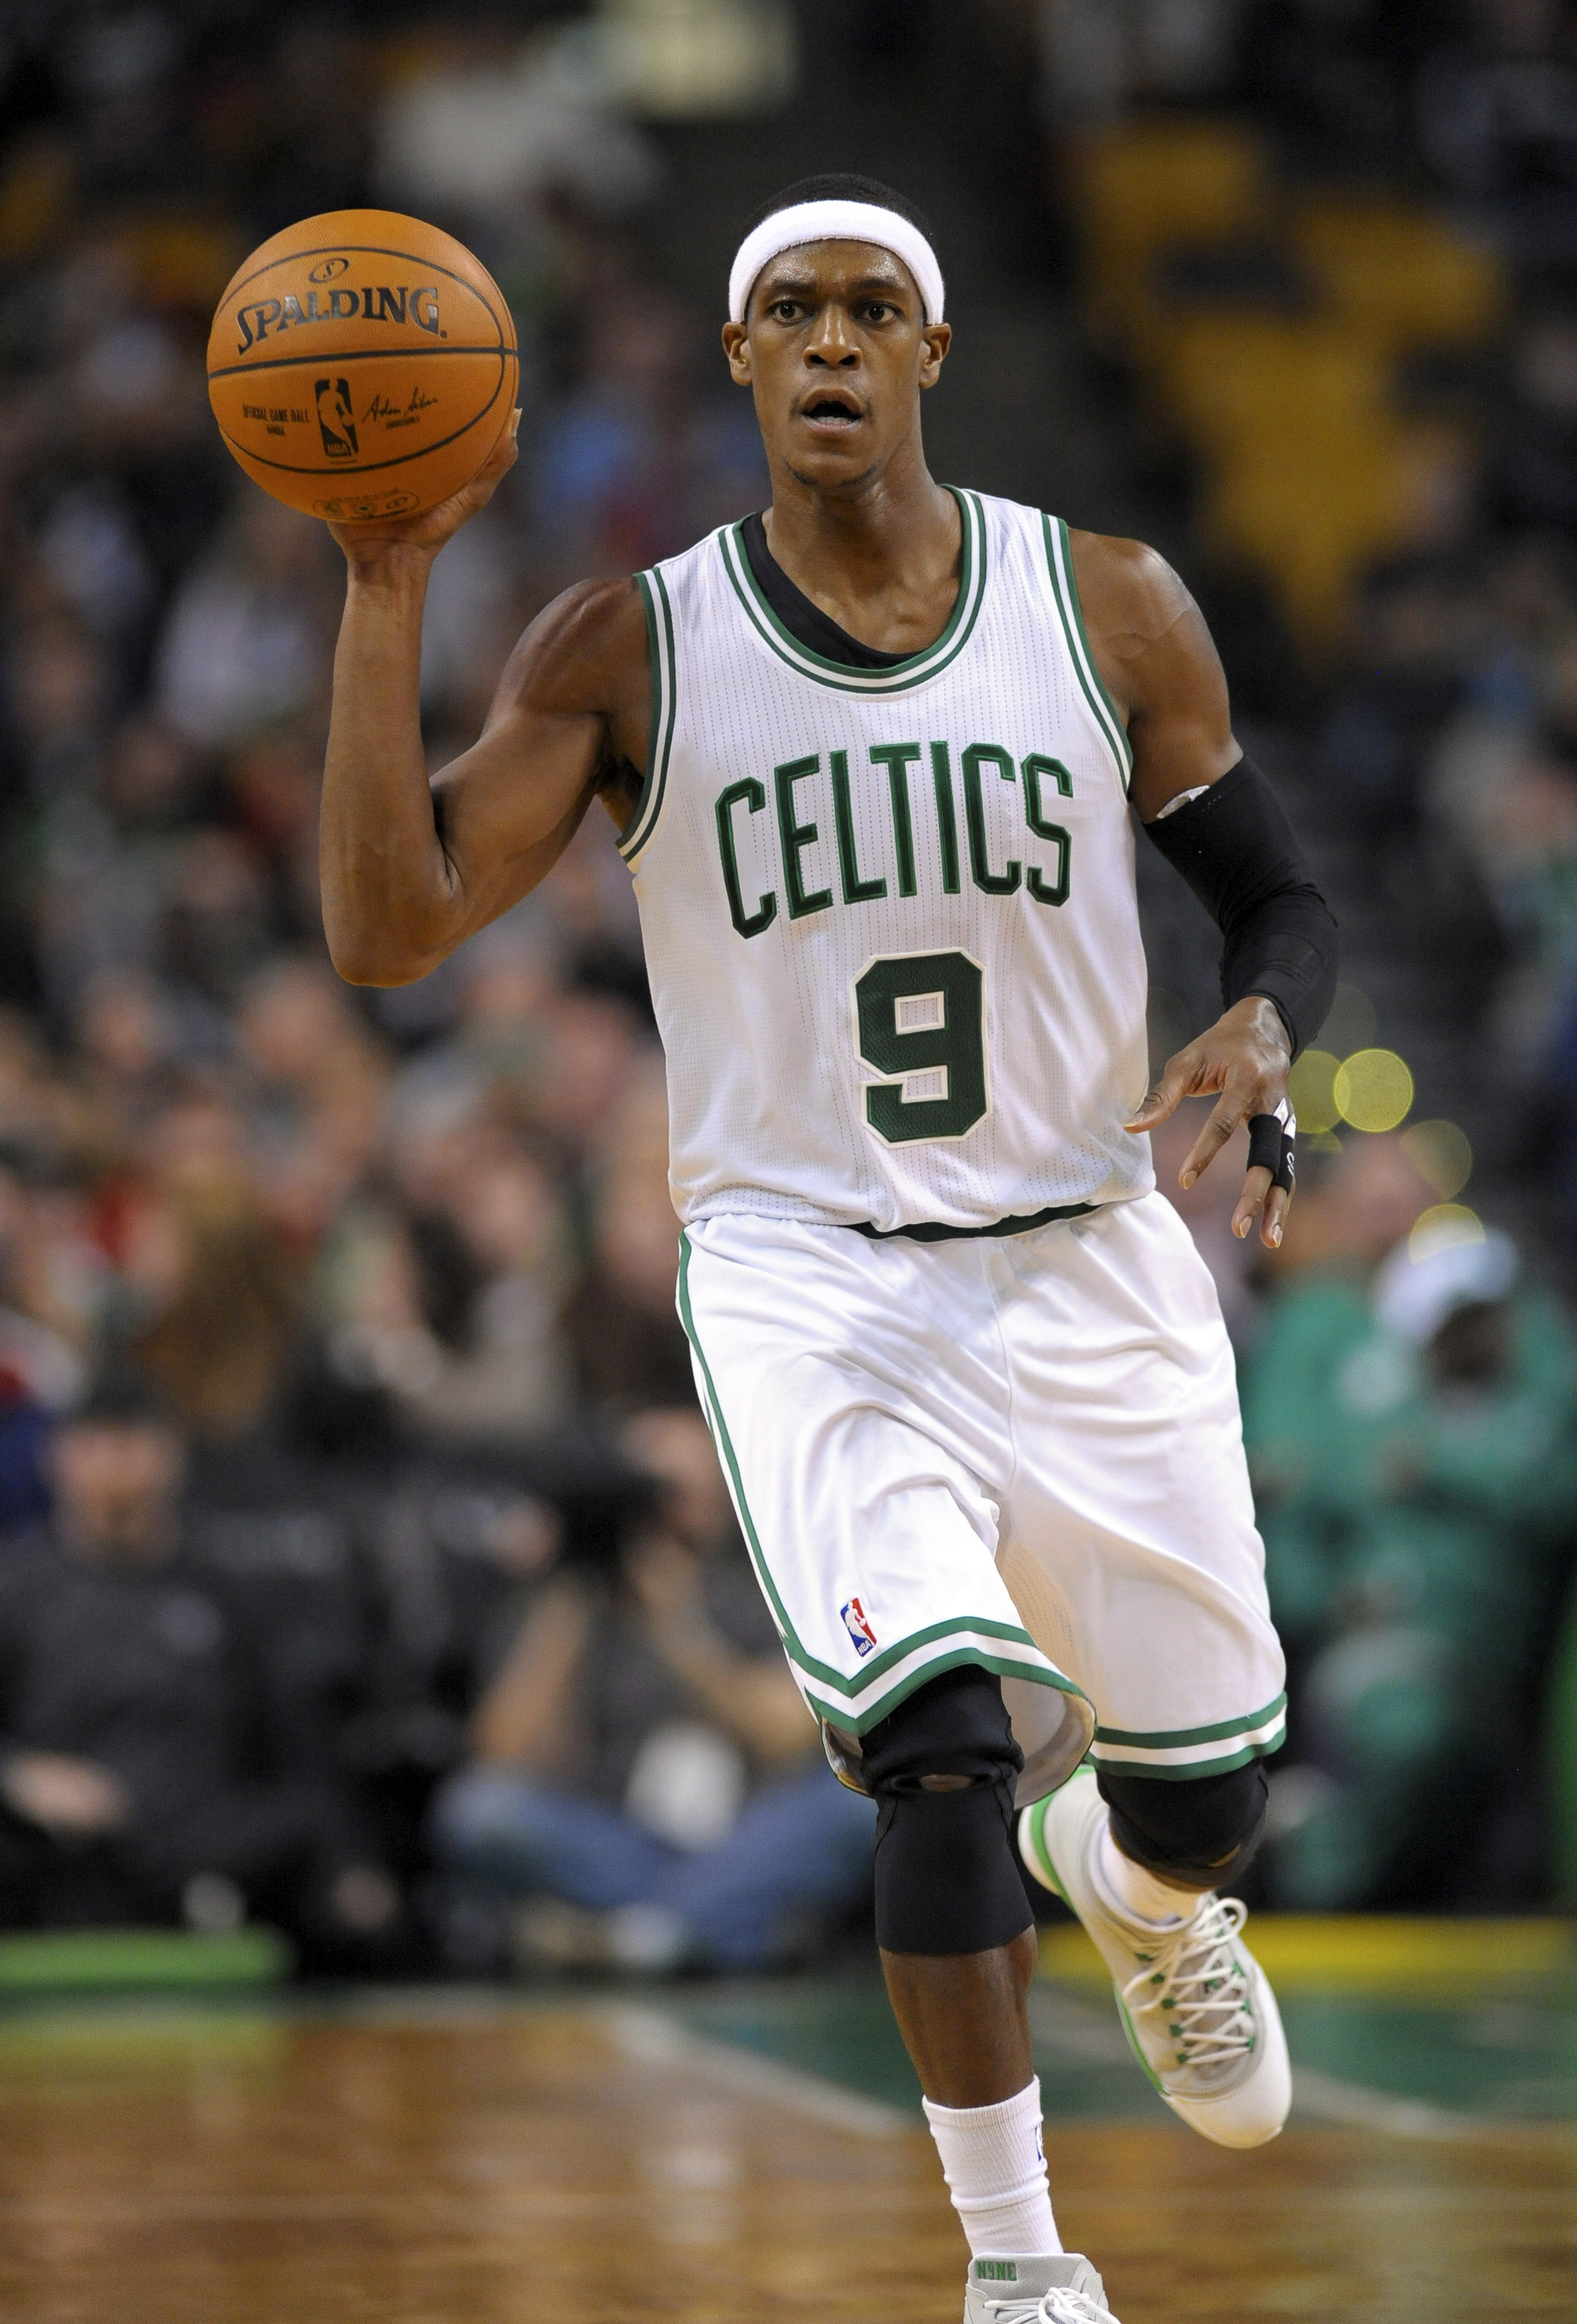 Nov 23, 2014; Boston, MA, USA; Boston Celtics guard Rajon Rondo (9) controls the ball during the second half against the Portland Trail Blazers at TD Garden. (Bob DeChiara-USA TODAY Sports)